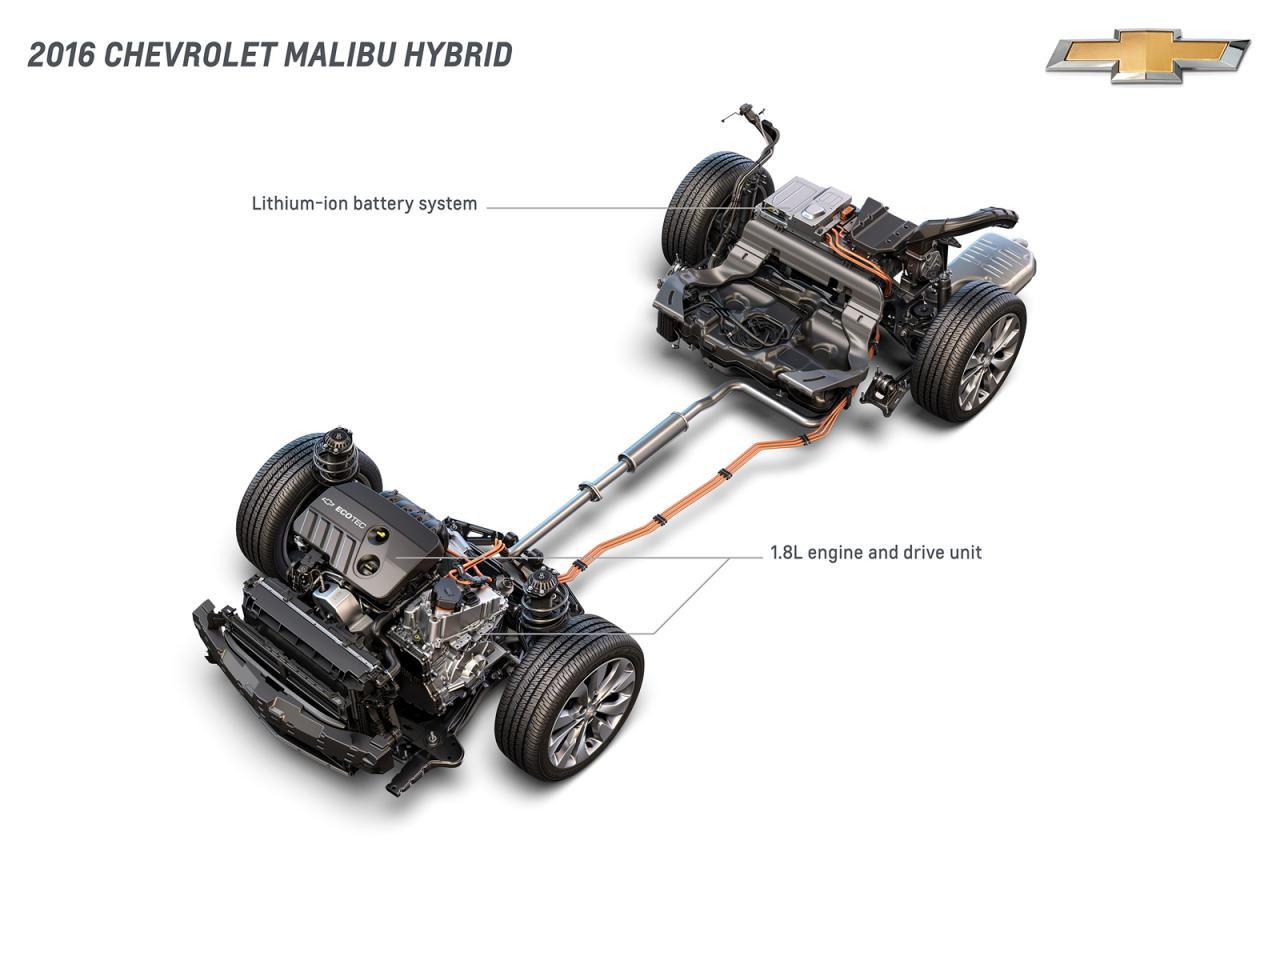 гибридный Chevrolet Malibu 2016